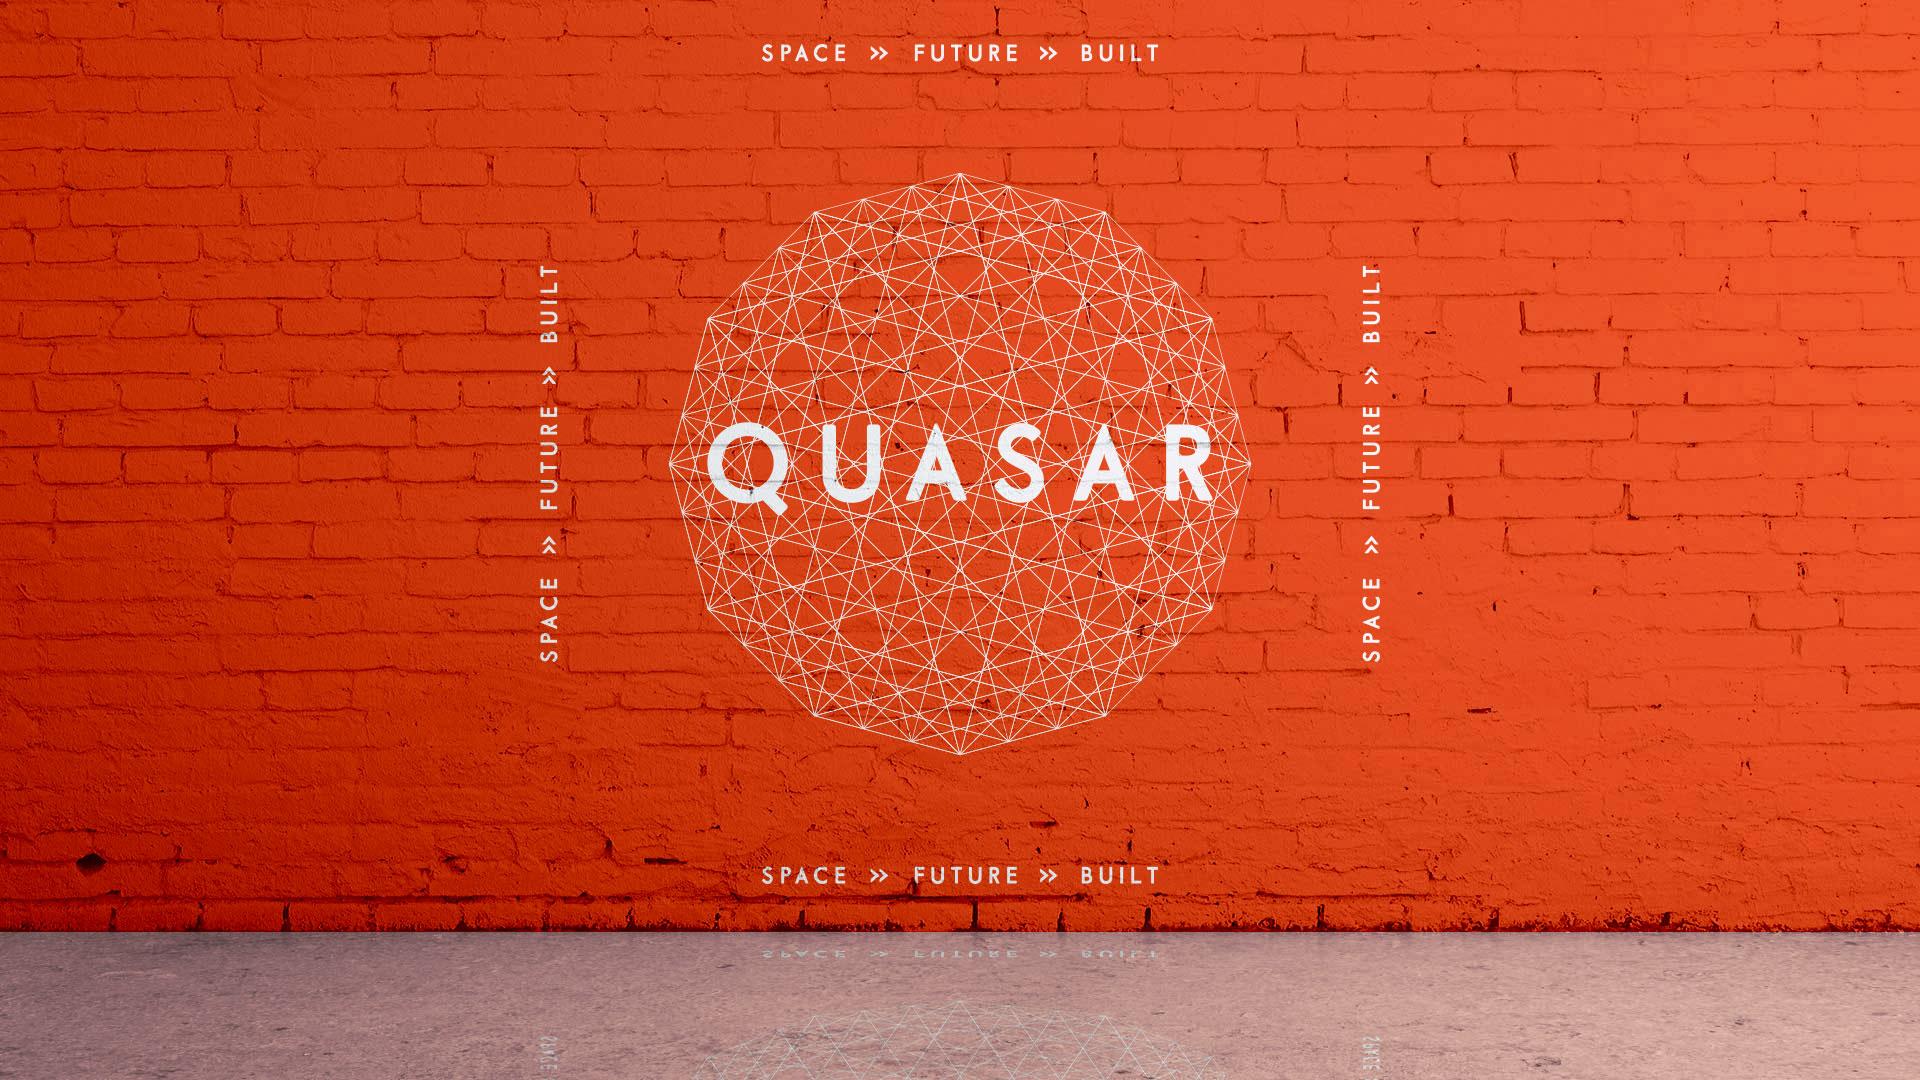 Quasar-Identity-MockUp-v9.jpg